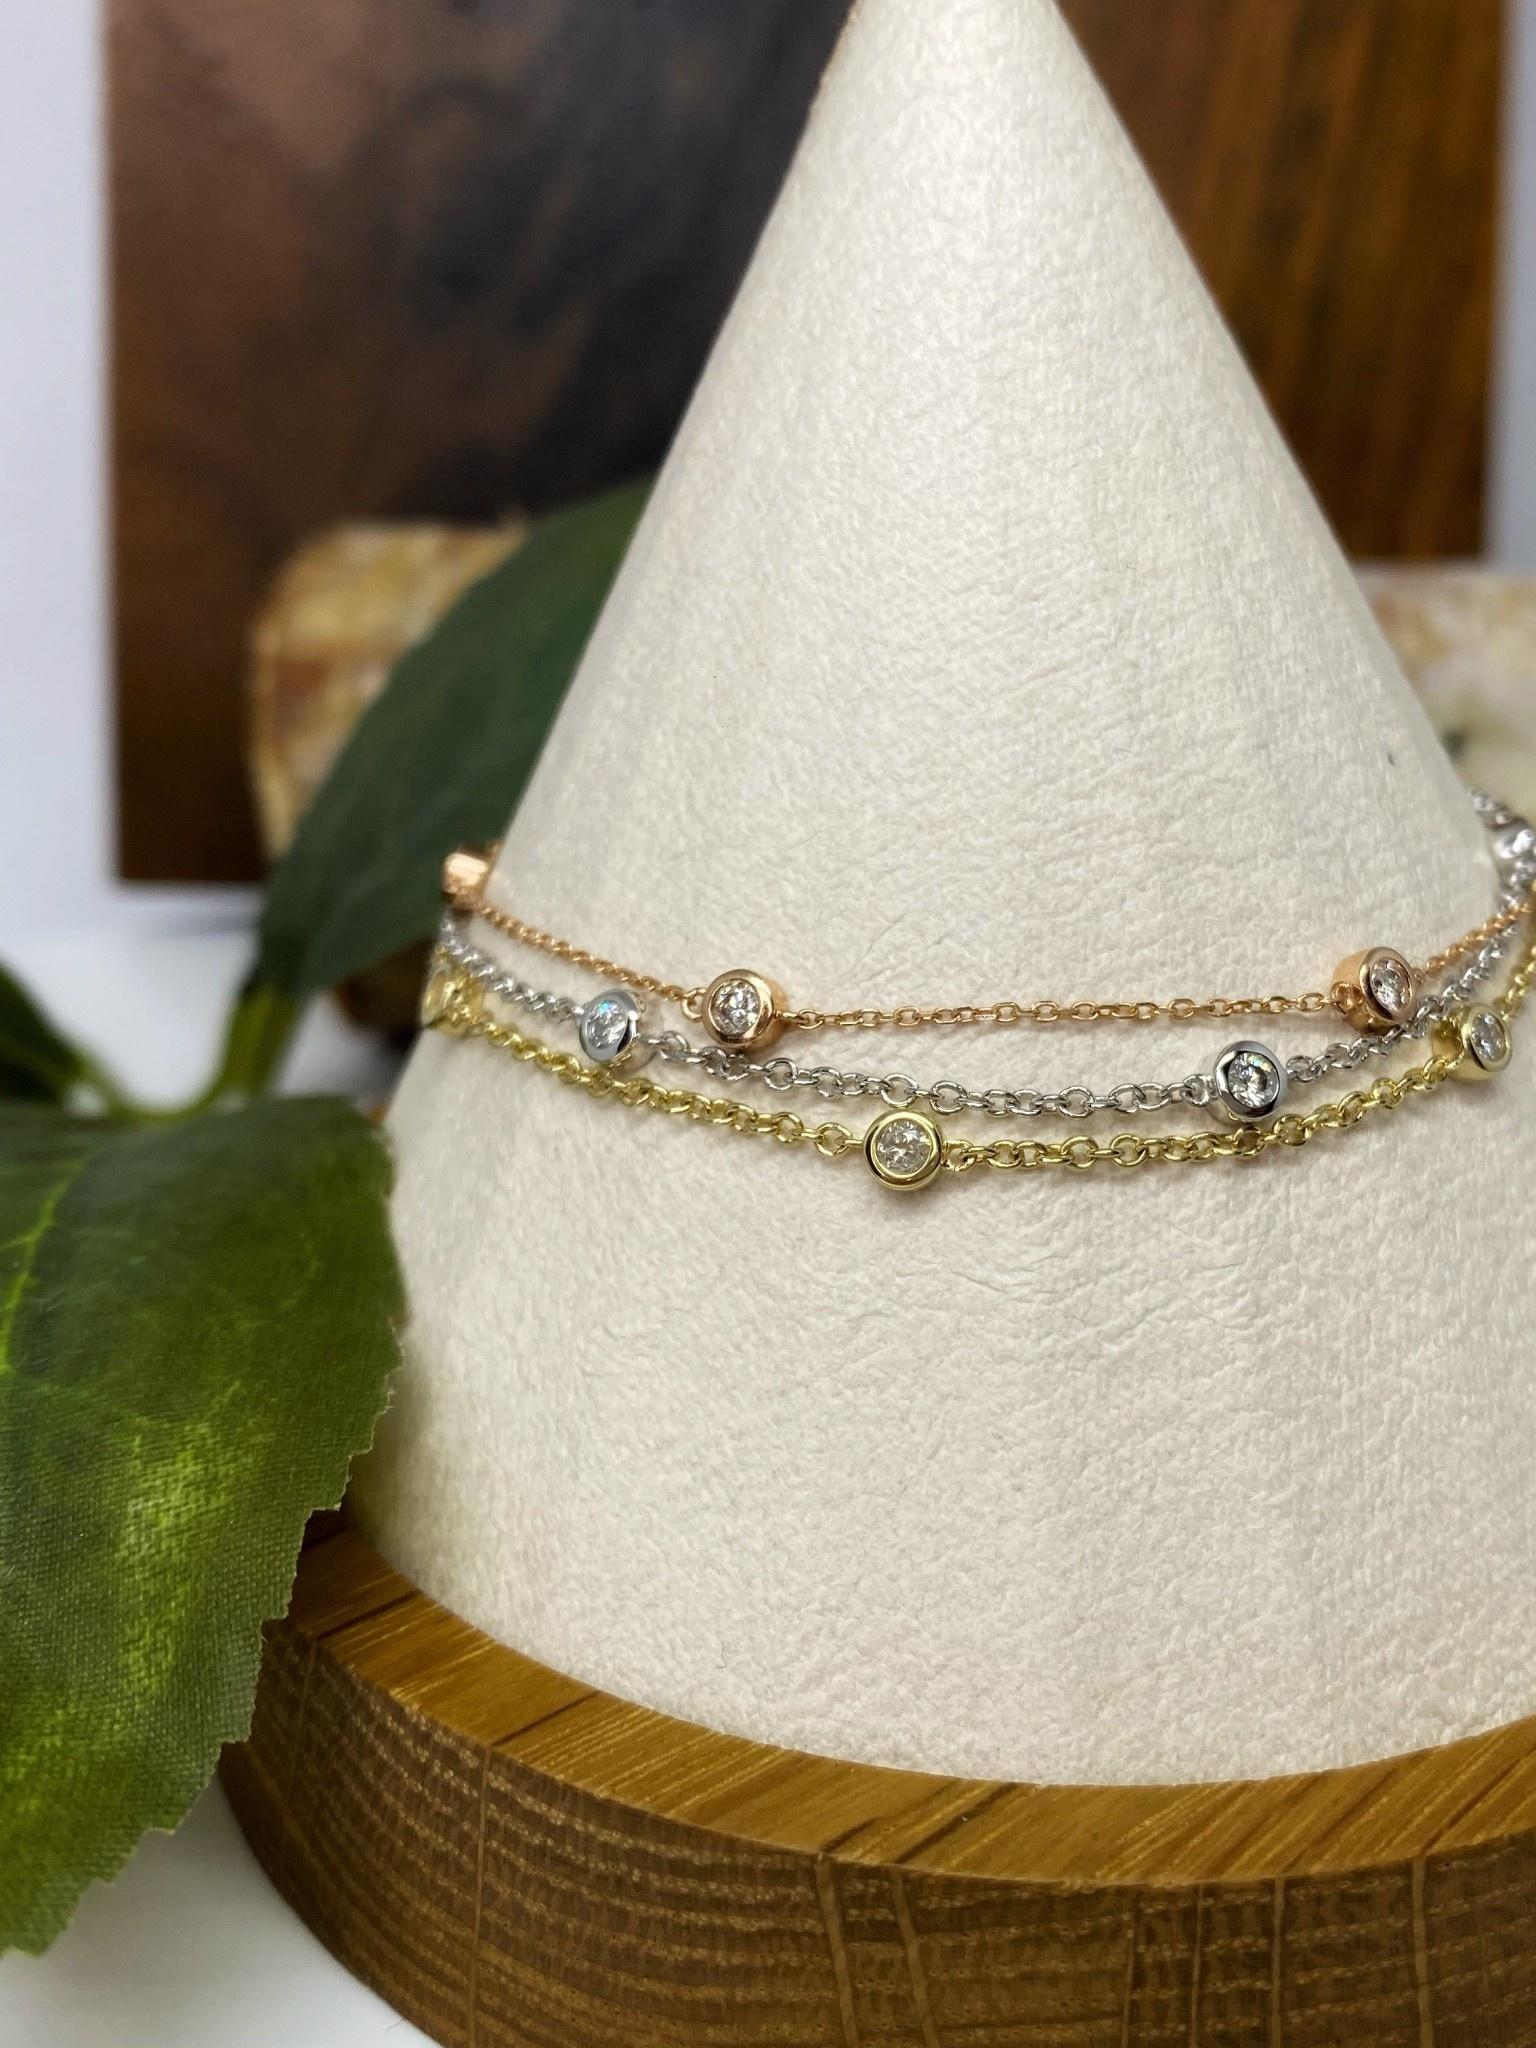 14K White Gold Bezel Set Diamond Bracelet